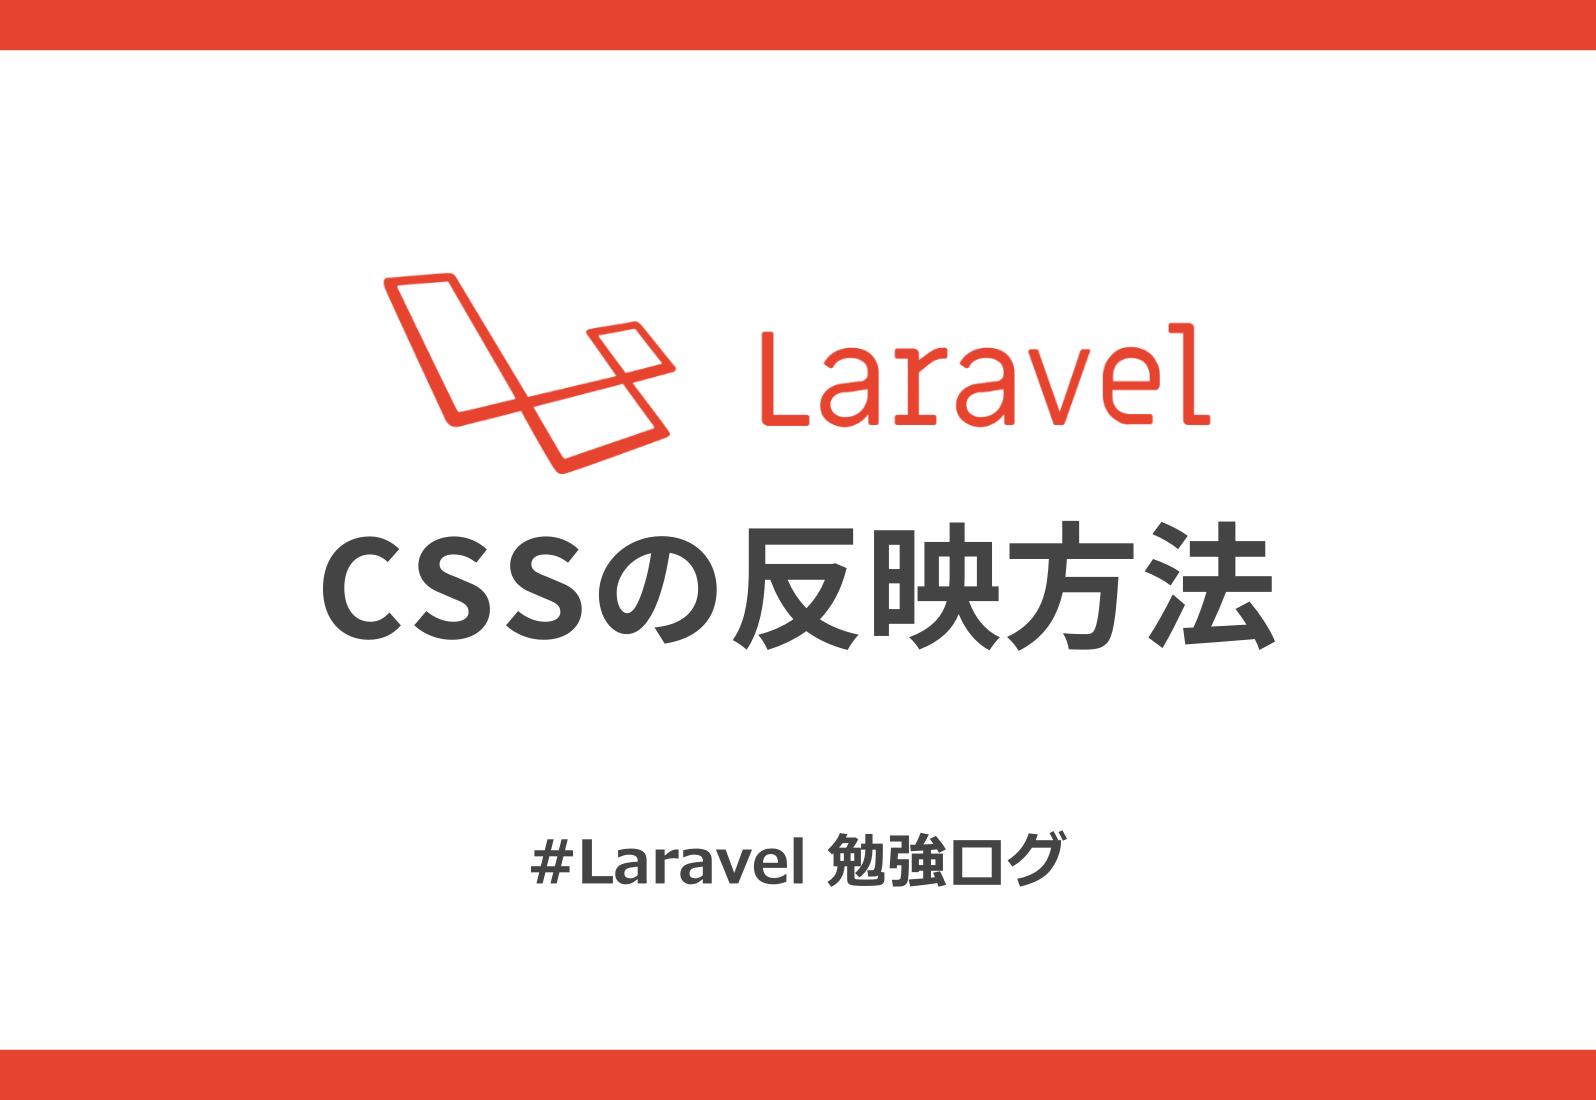 laravel_css